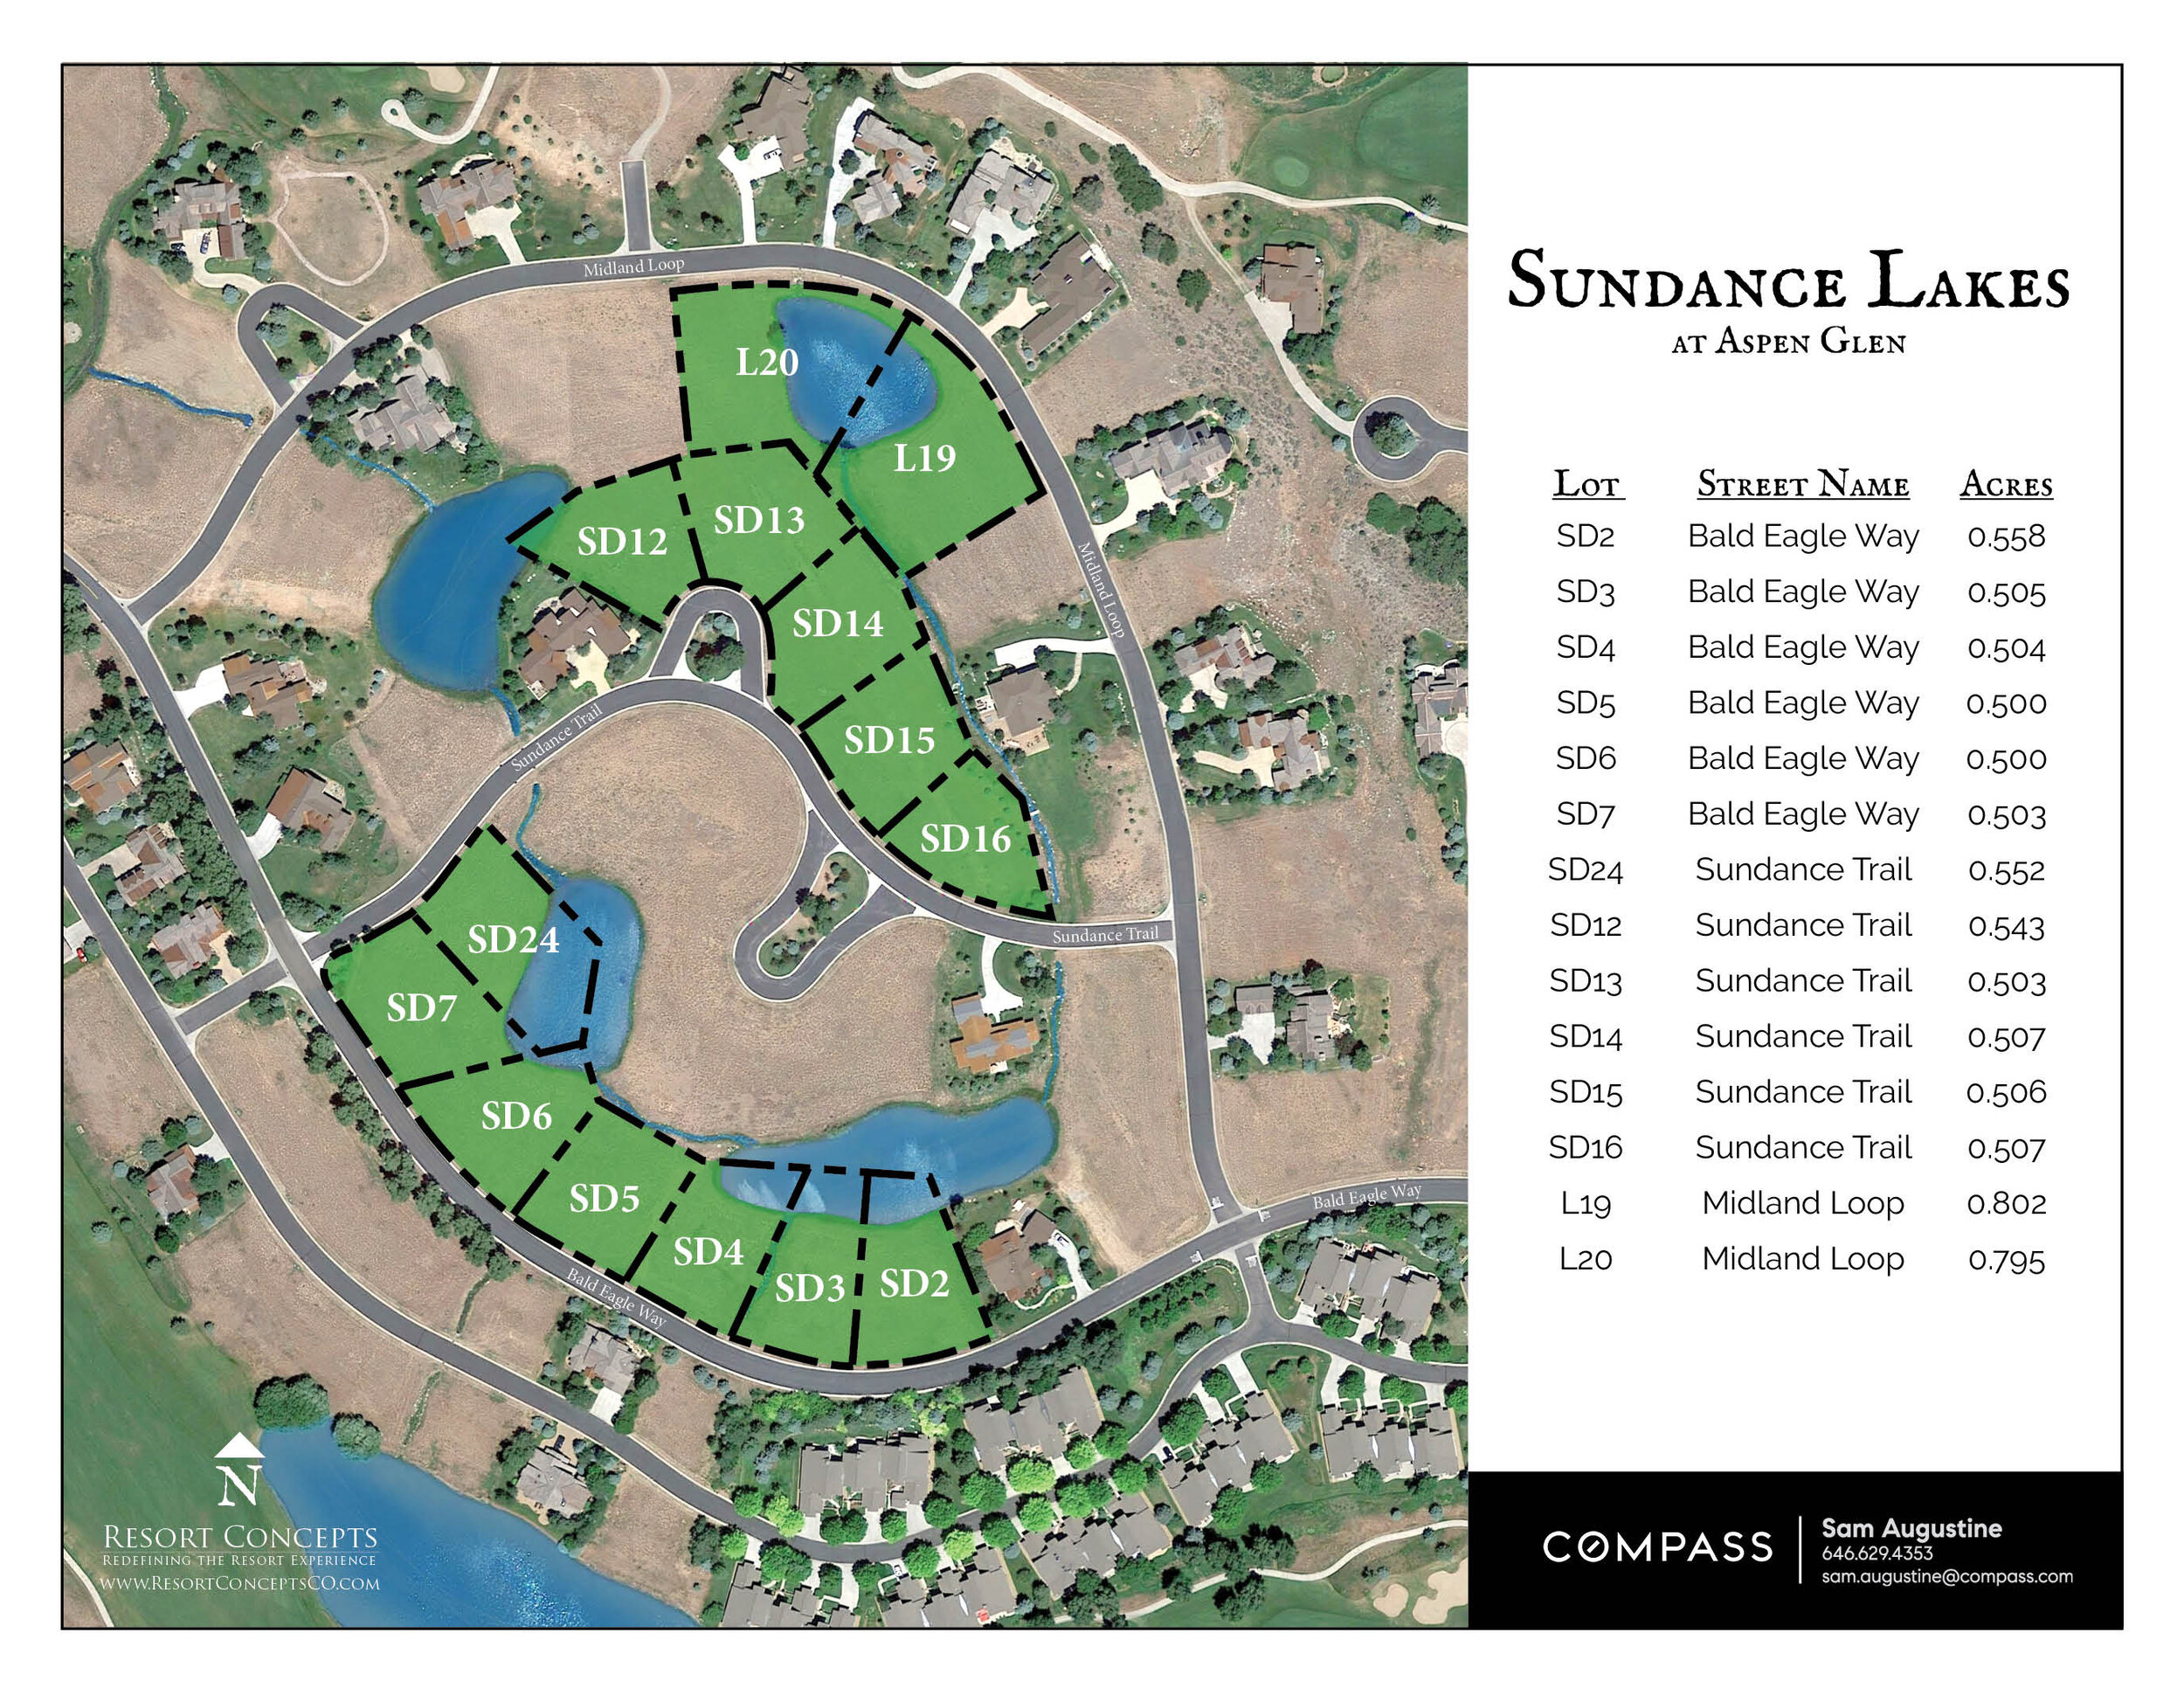 Sundance Lakes Site Plan 8.20.19.jpg